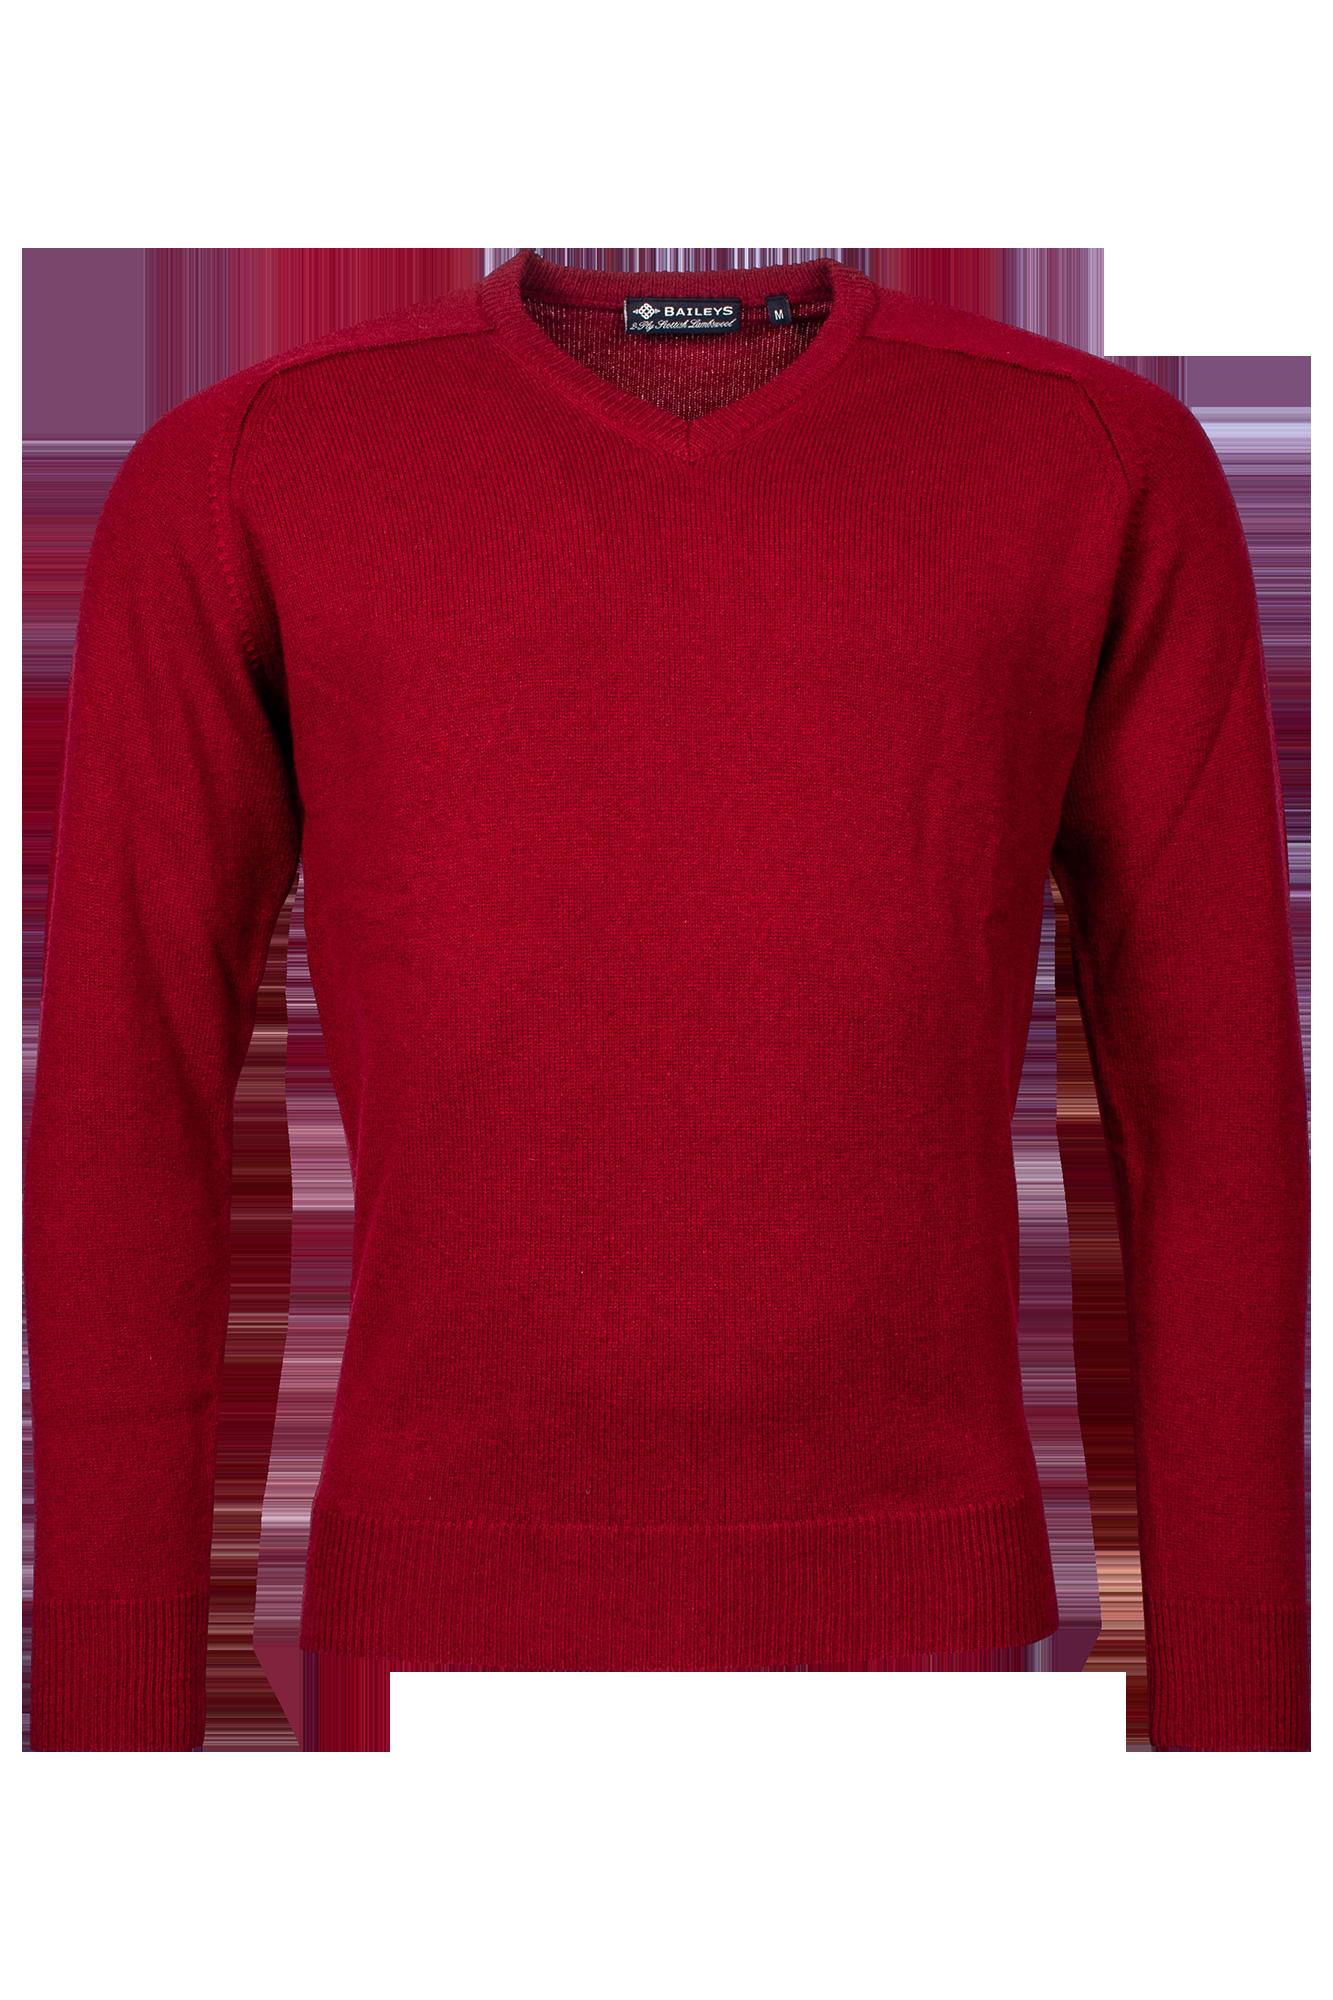 Baileys lamswollen pullover, v-hals, donkerrood